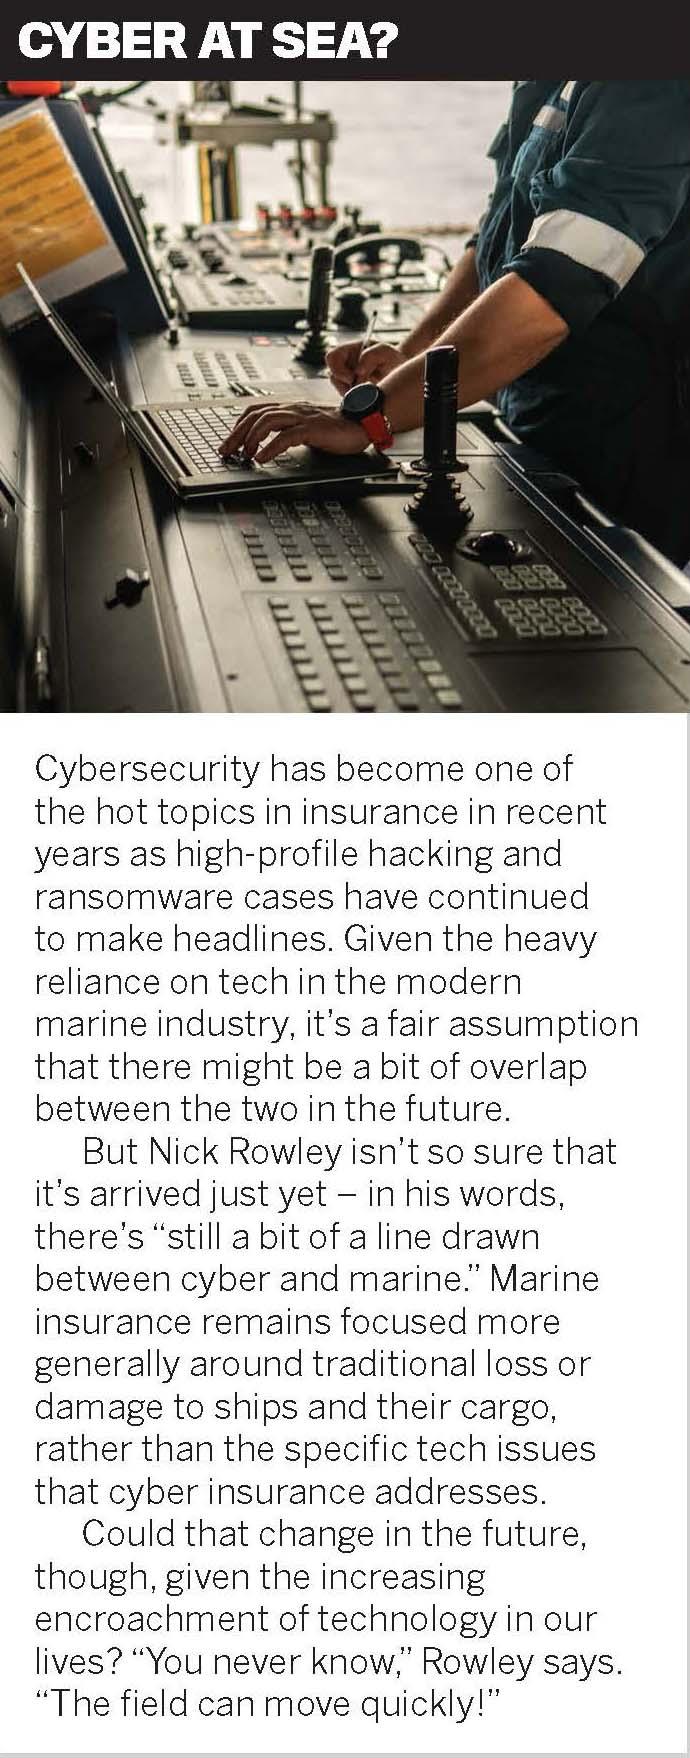 Cyber at sea?